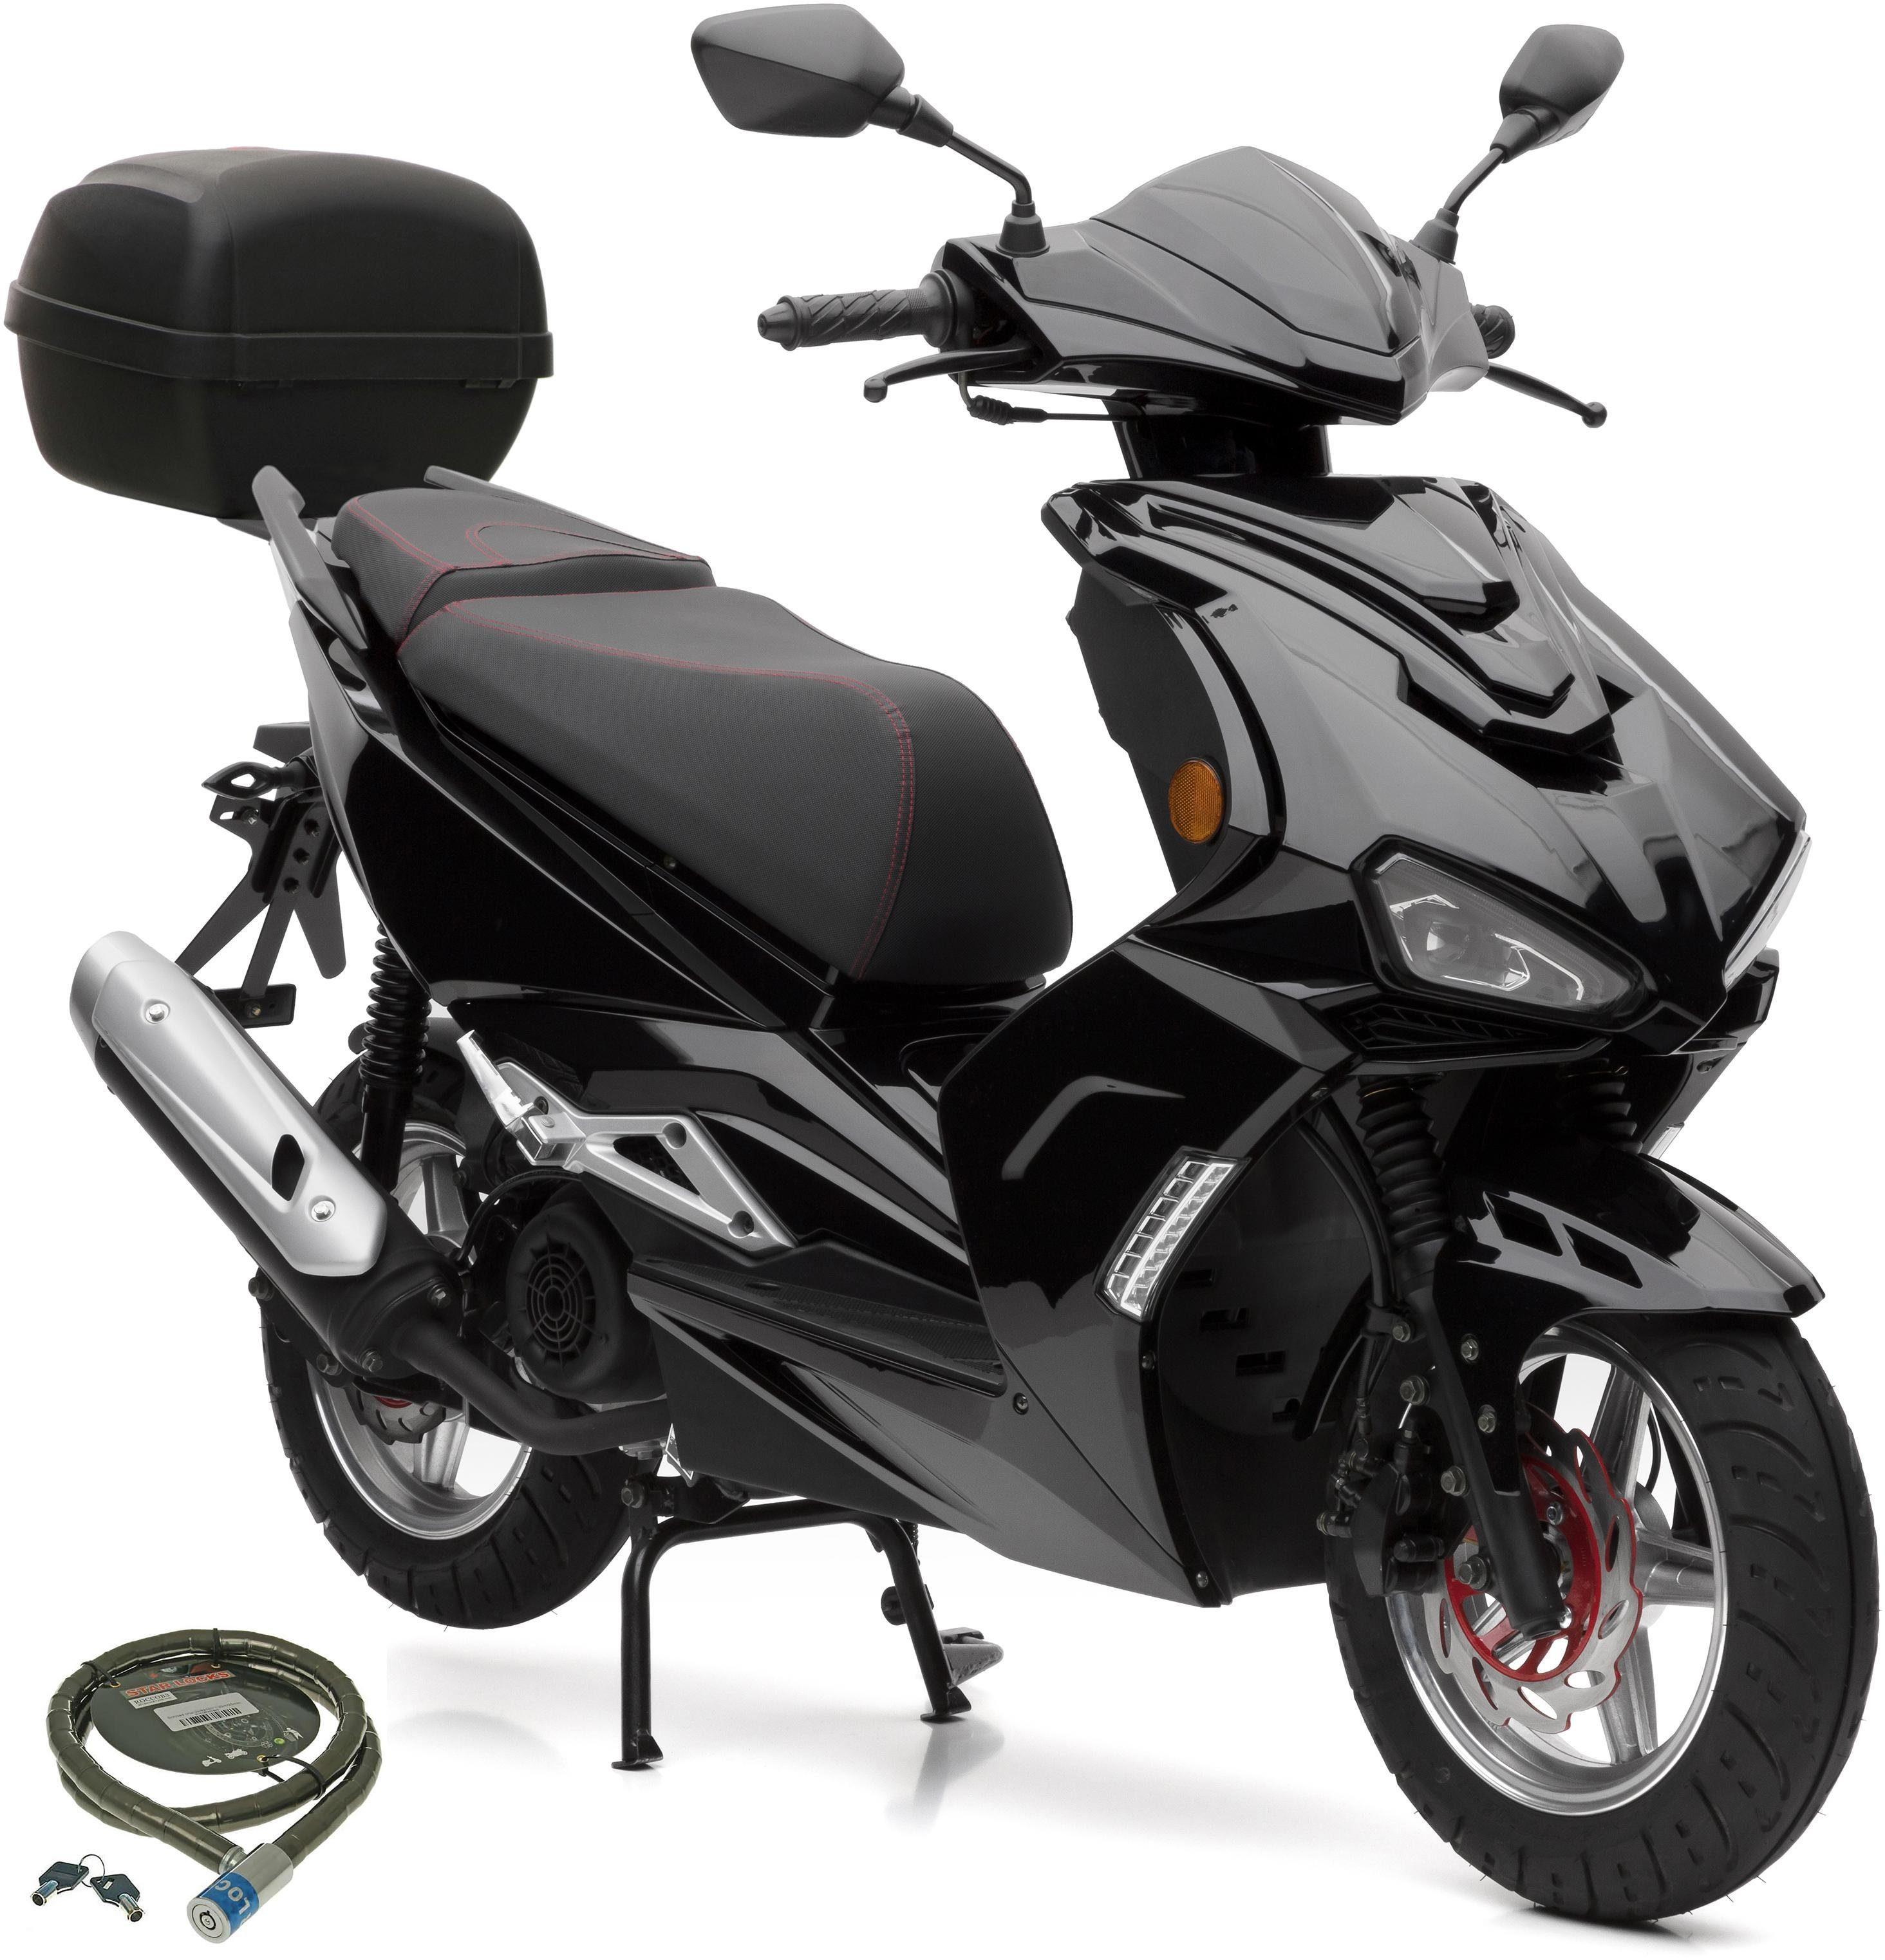 Nova Motors Motorroller »SP125i«, 125 ccm, 80 km/h, Euro 4, (Set, mit Topcase), inkl. Topcase, 125 ccm, 80 km/h